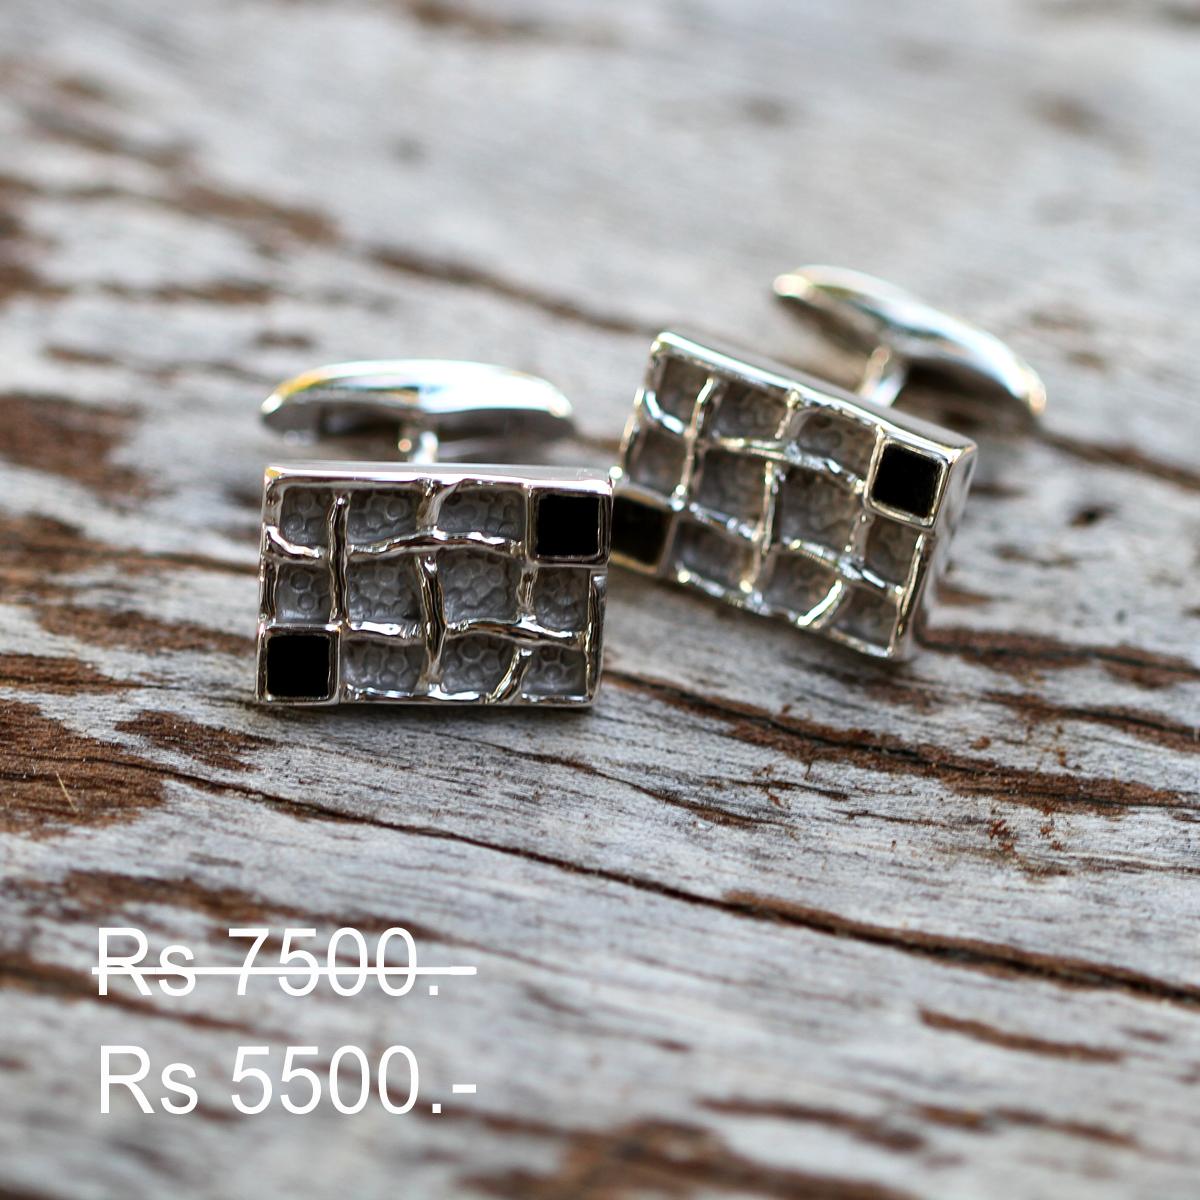 Cufflinks sale